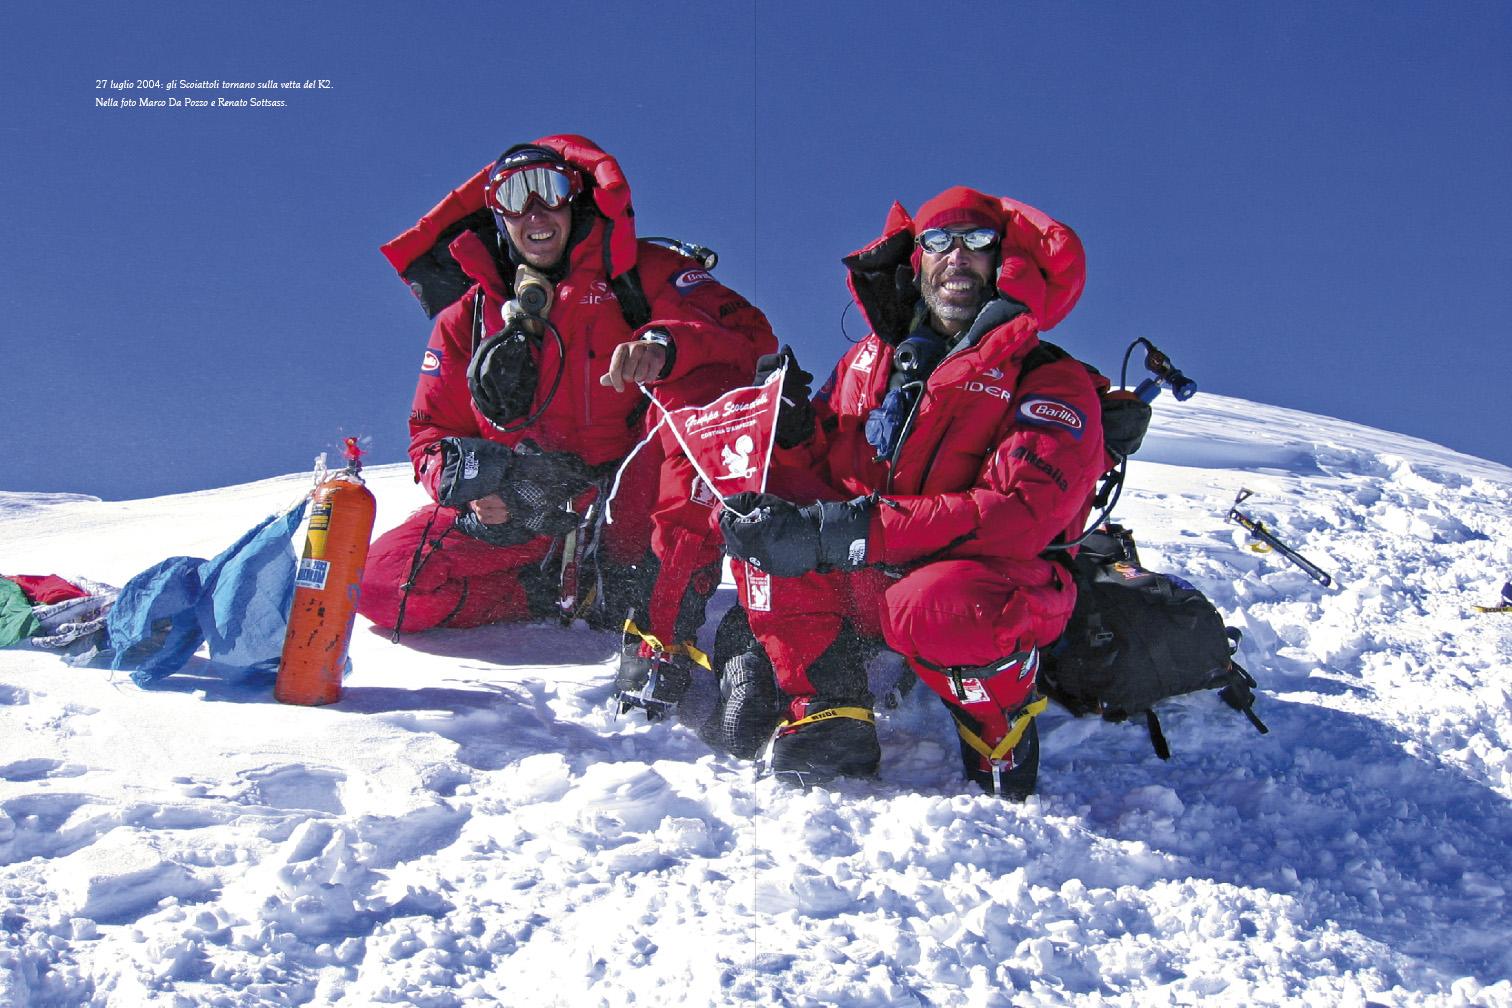 K2 EXPEDITION 1954-2004 Giuseppe Ghedina Fotografo - 087.jpg